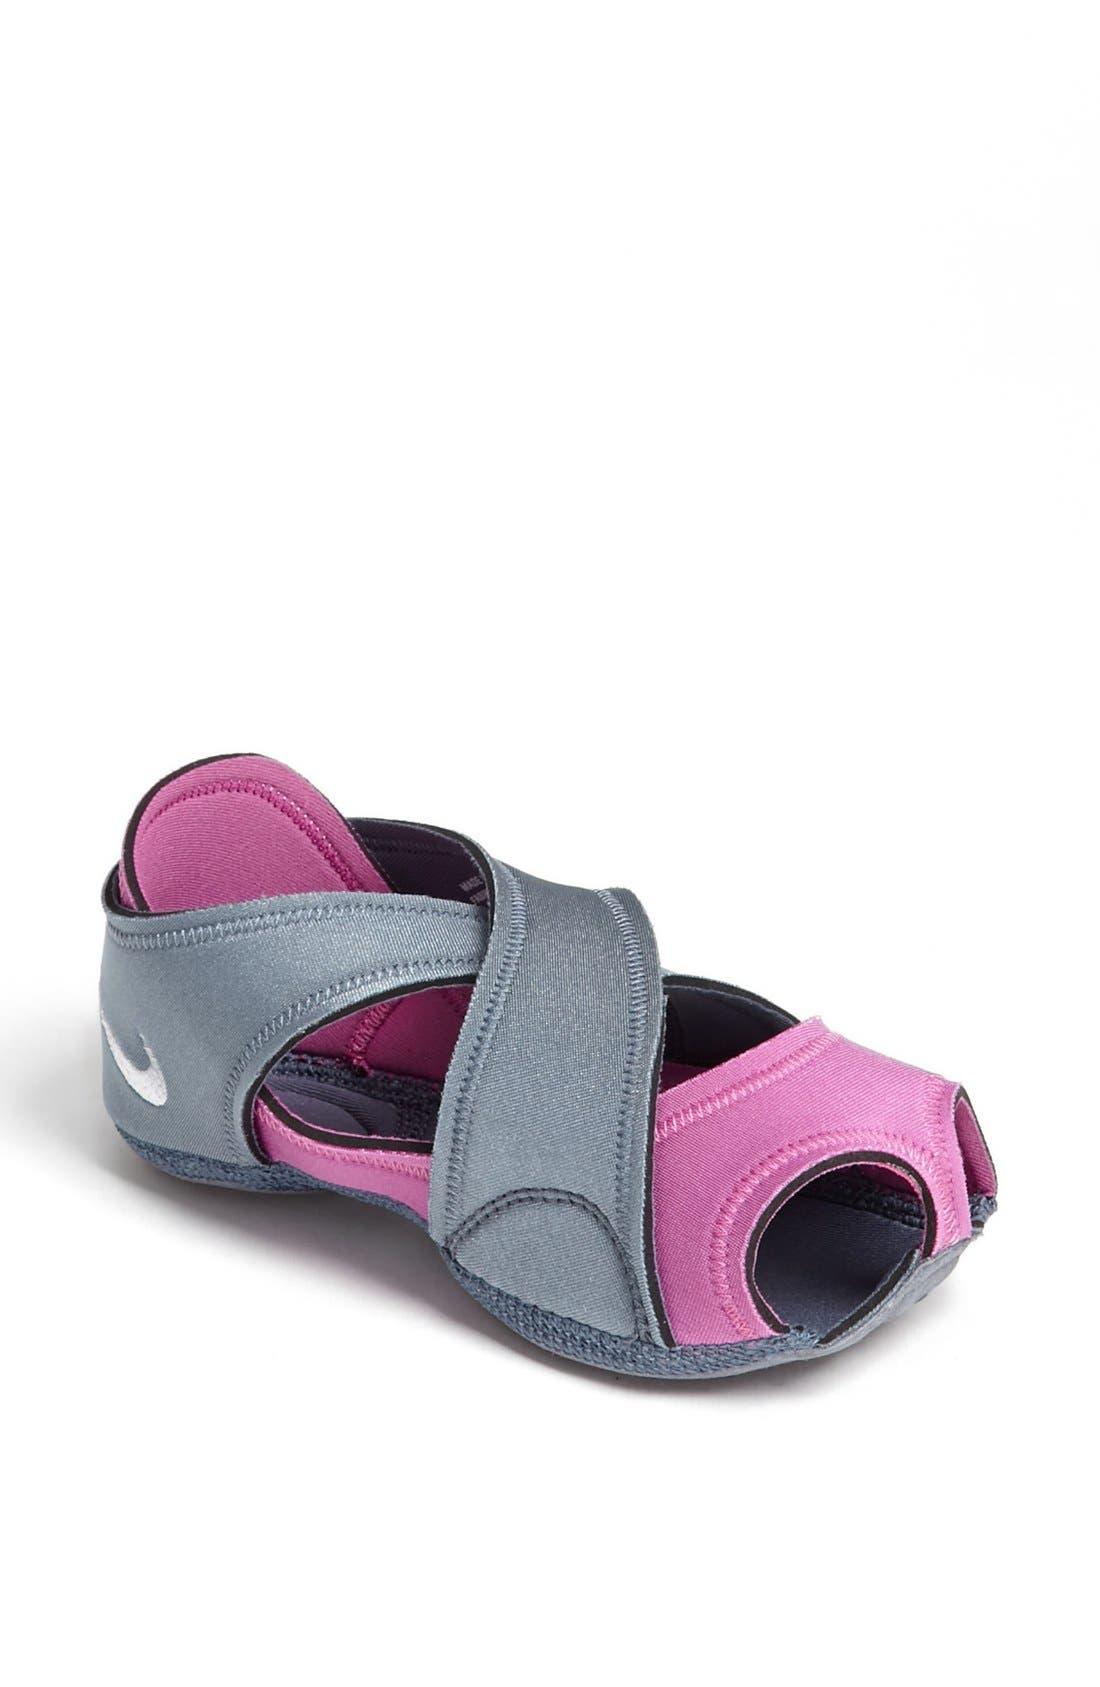 Alternate Image 1 Selected - Nike 'Studio Wrap' Yoga Training Shoe (Women)